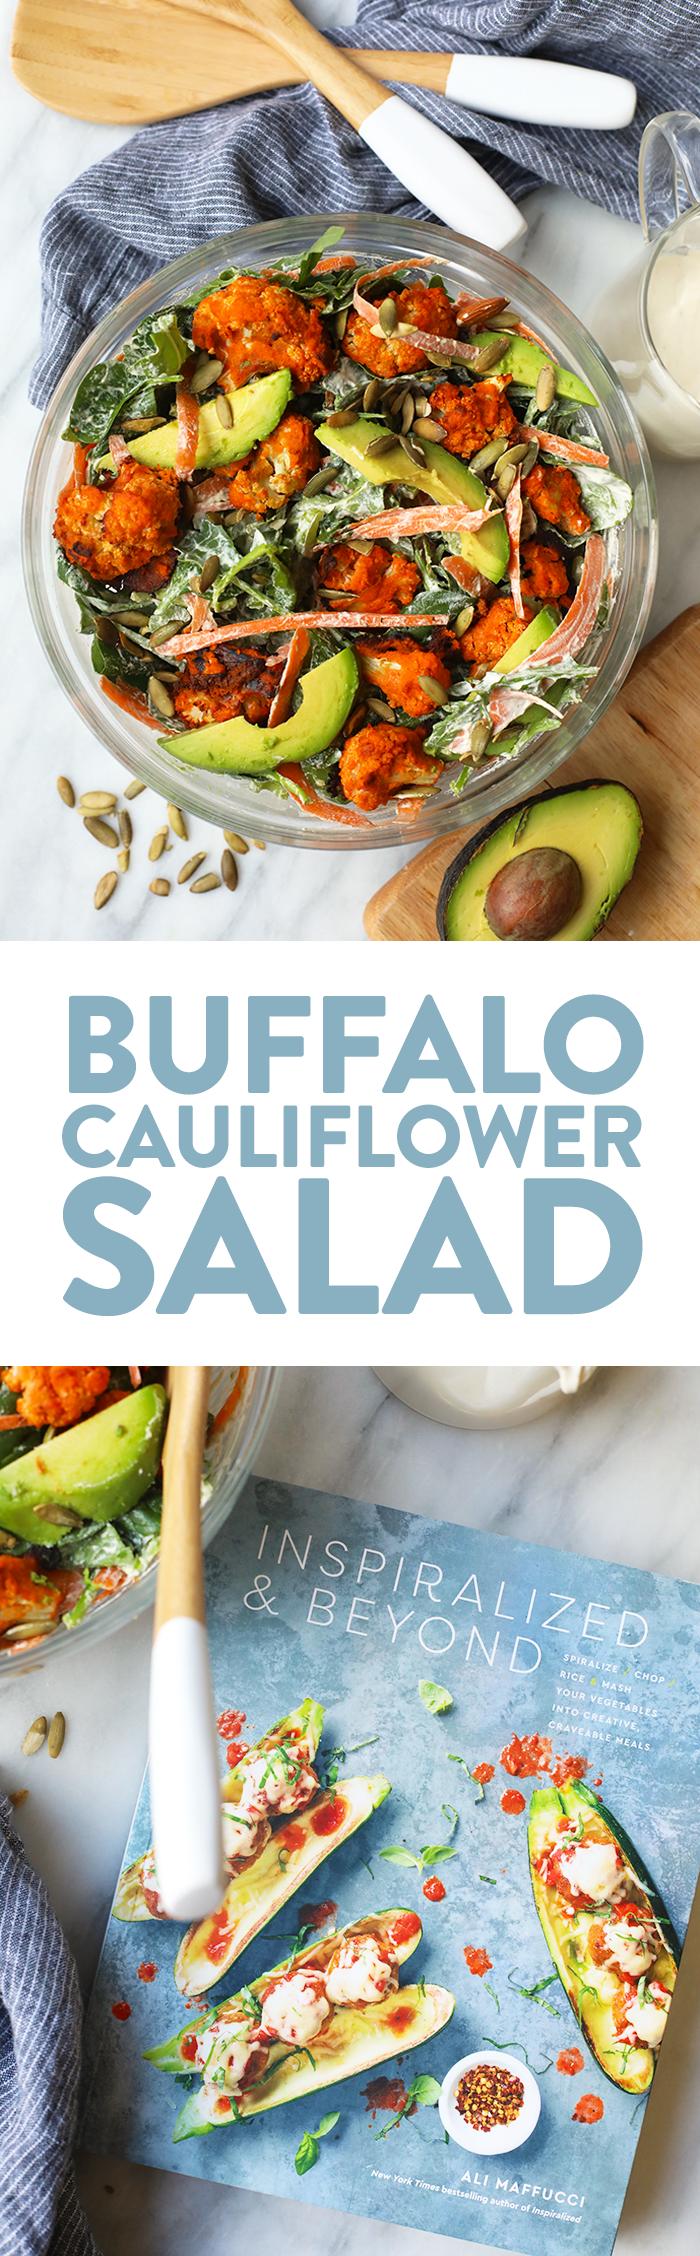 Vegan Buffalo Cauliflower Salad - Fit Foodie Finds